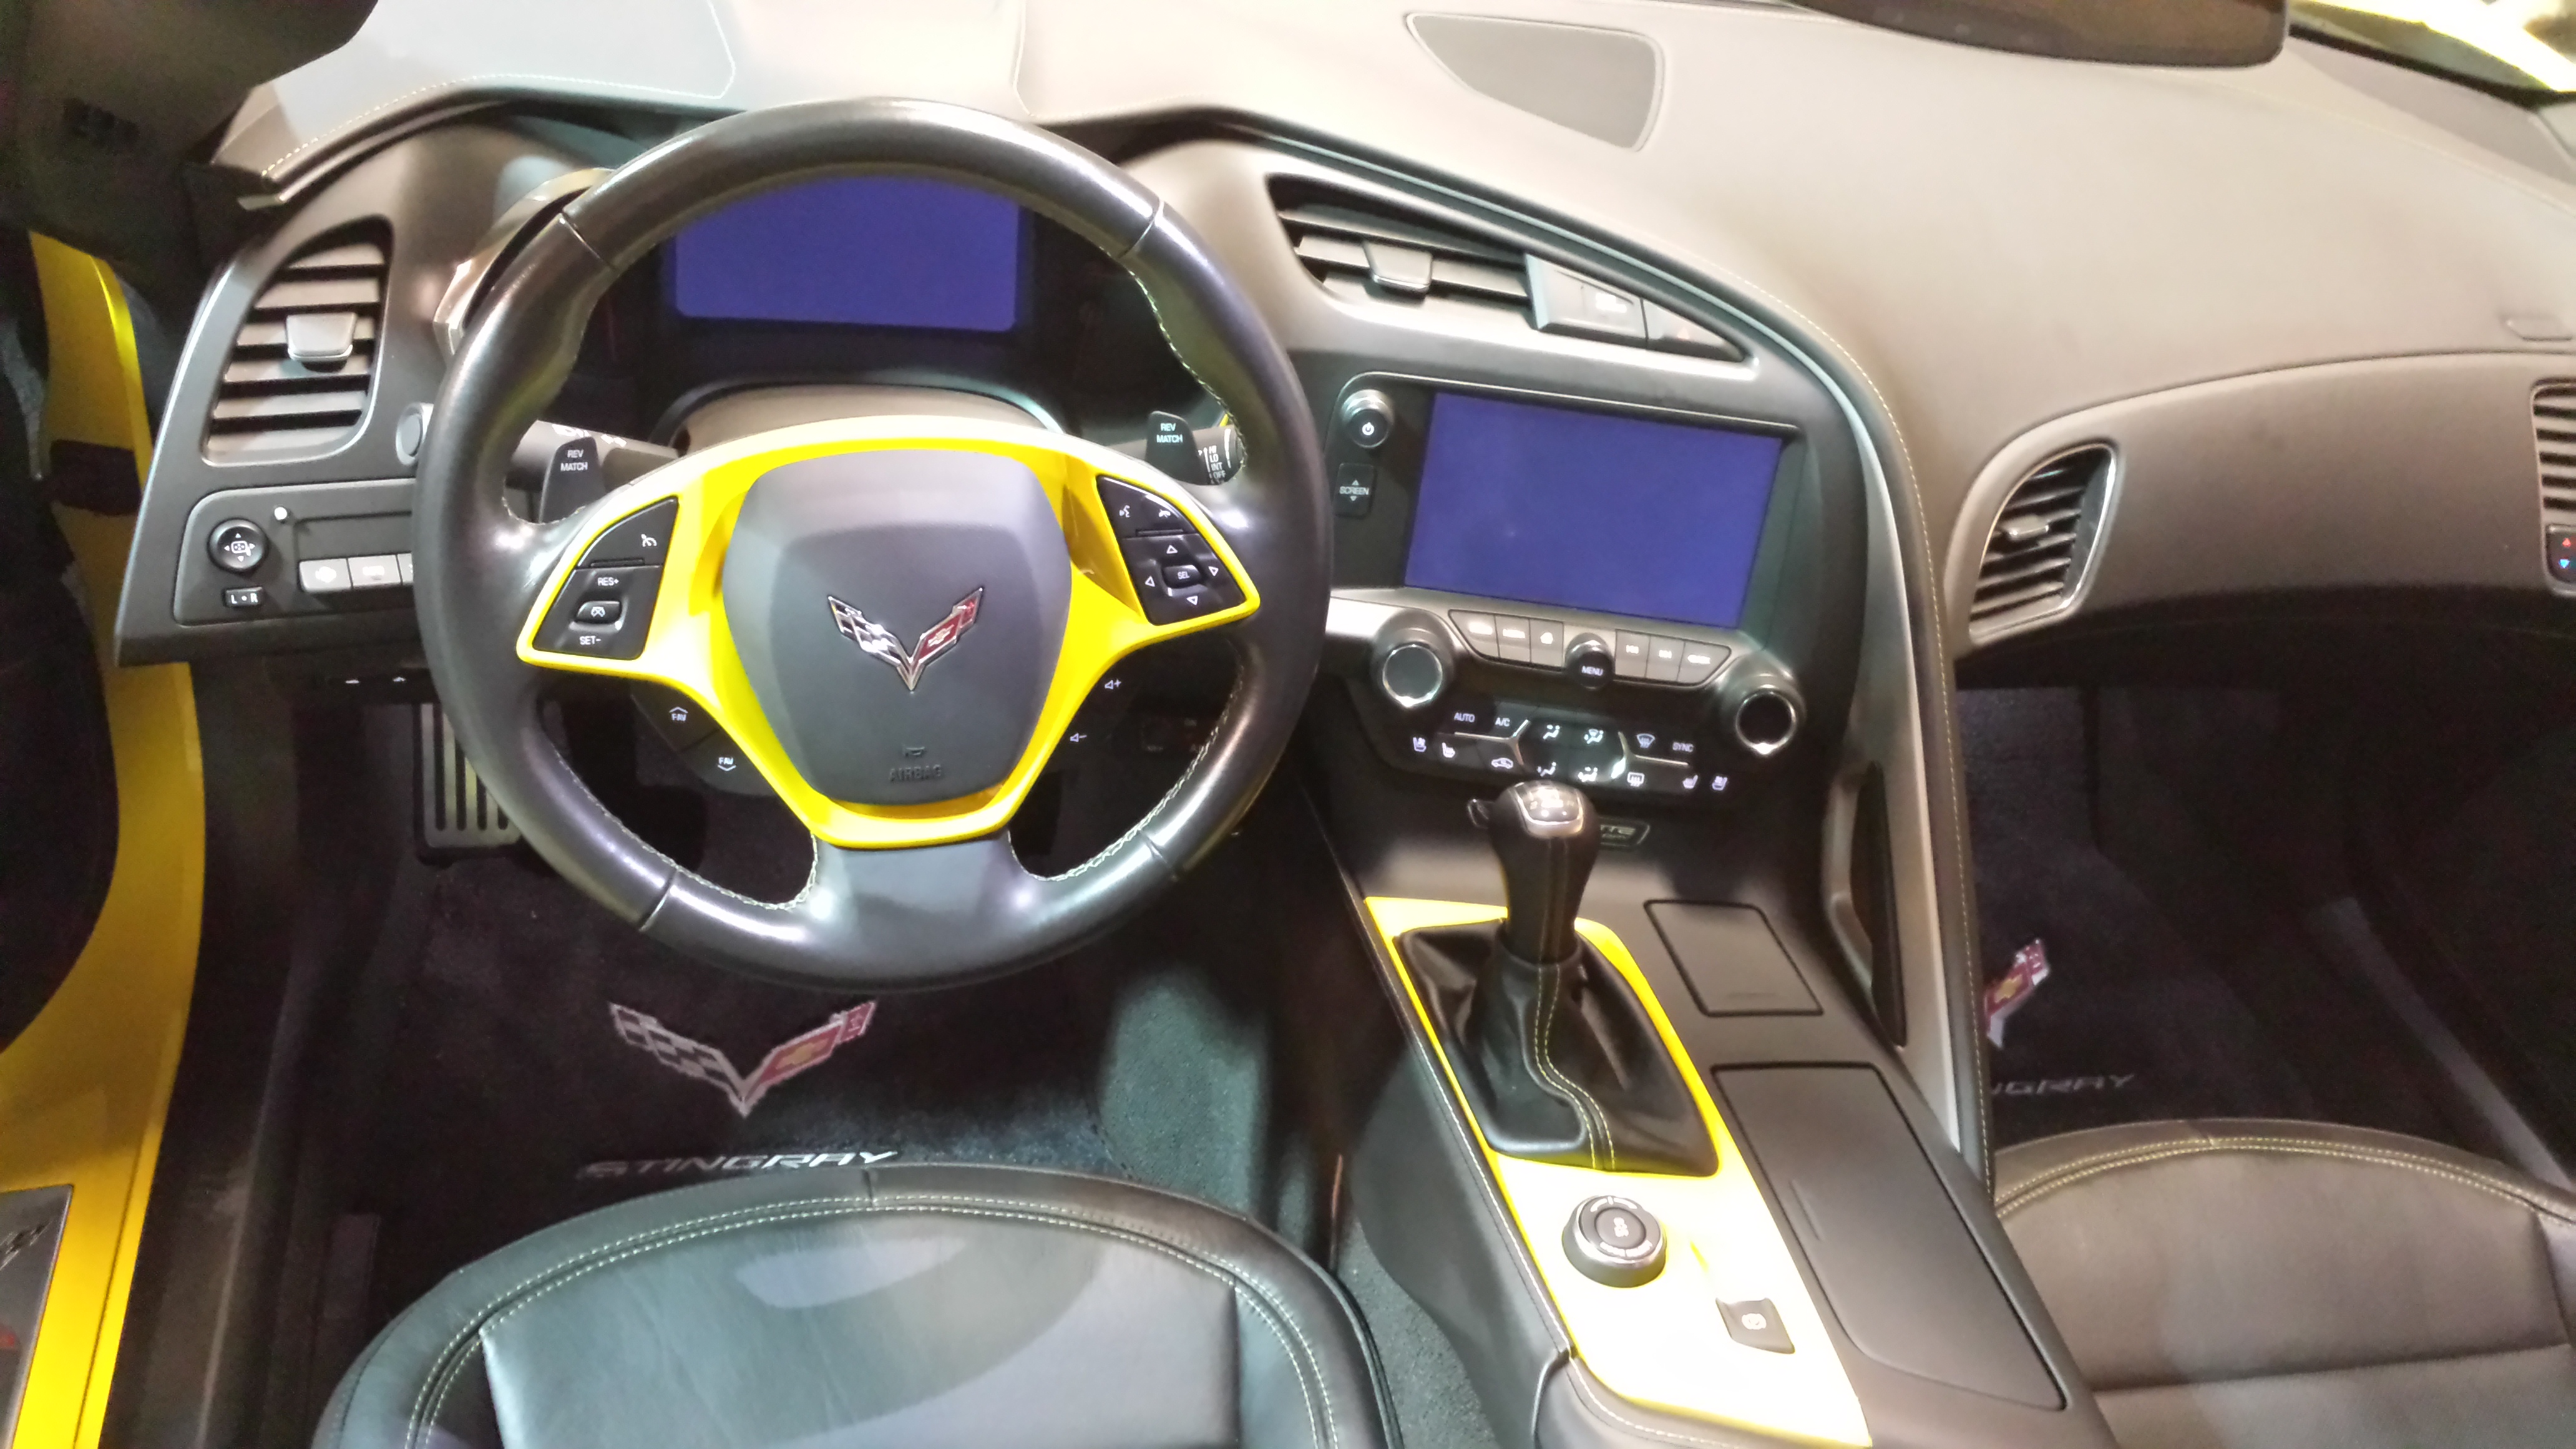 Matt3310s My Stingray Build Thread C7 Corvette Painted Fuse Box Cover Name Interior Views 962 Size 205 Mb